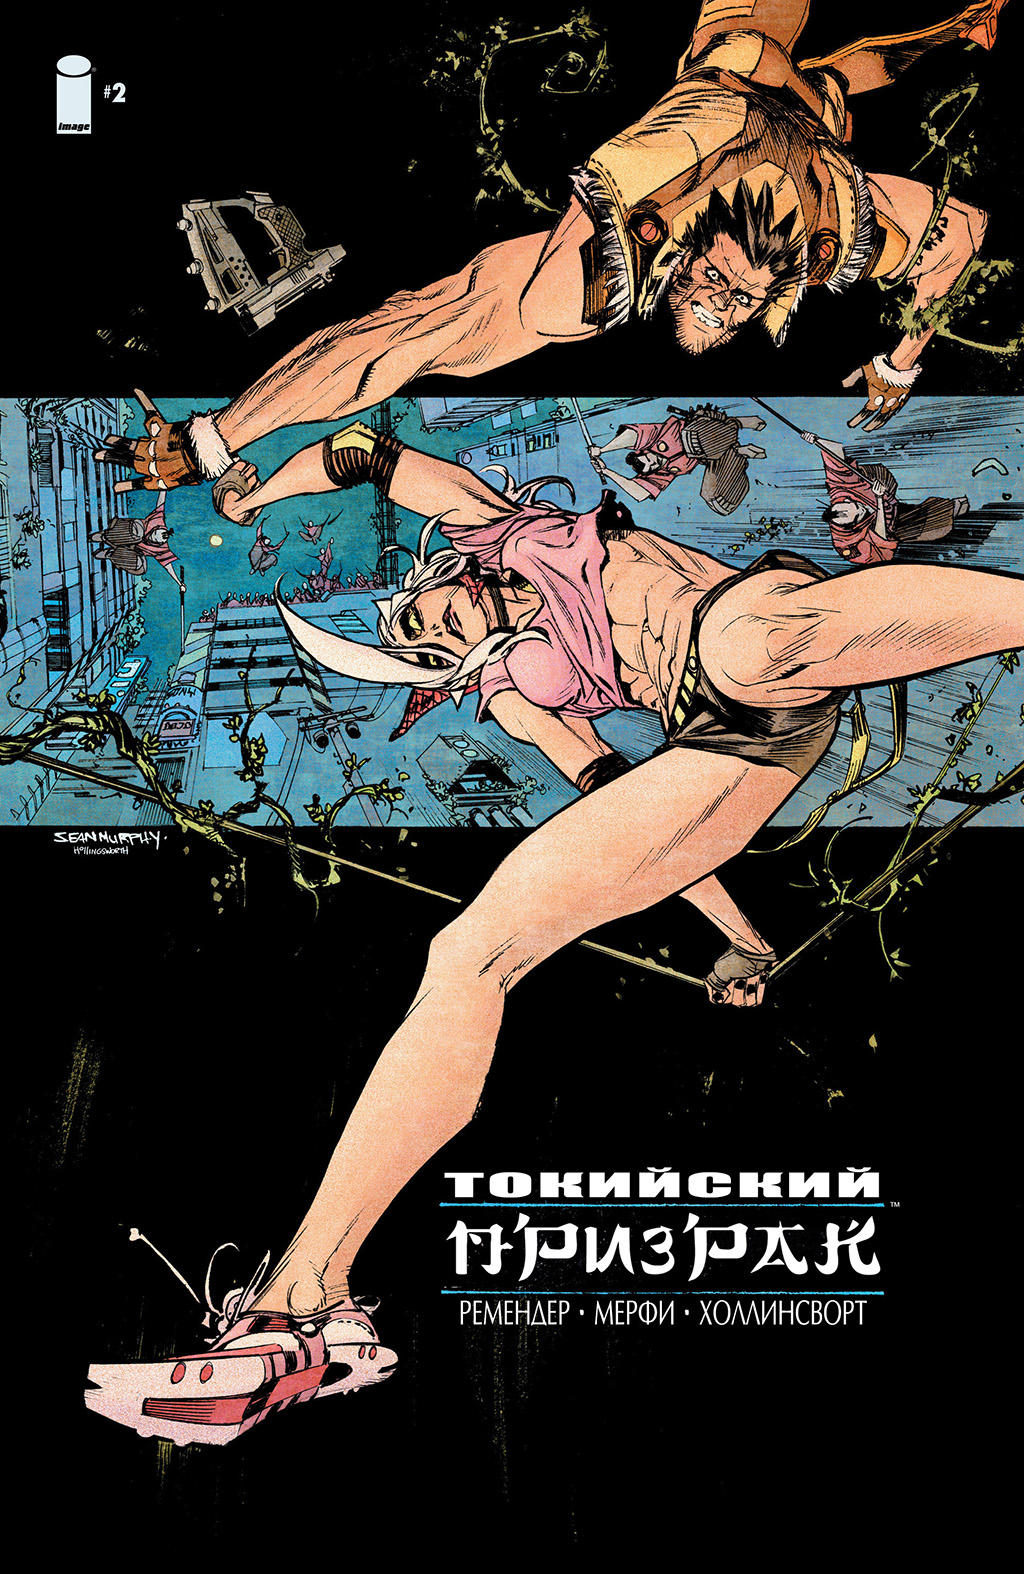 Комикс Токийский Призрак